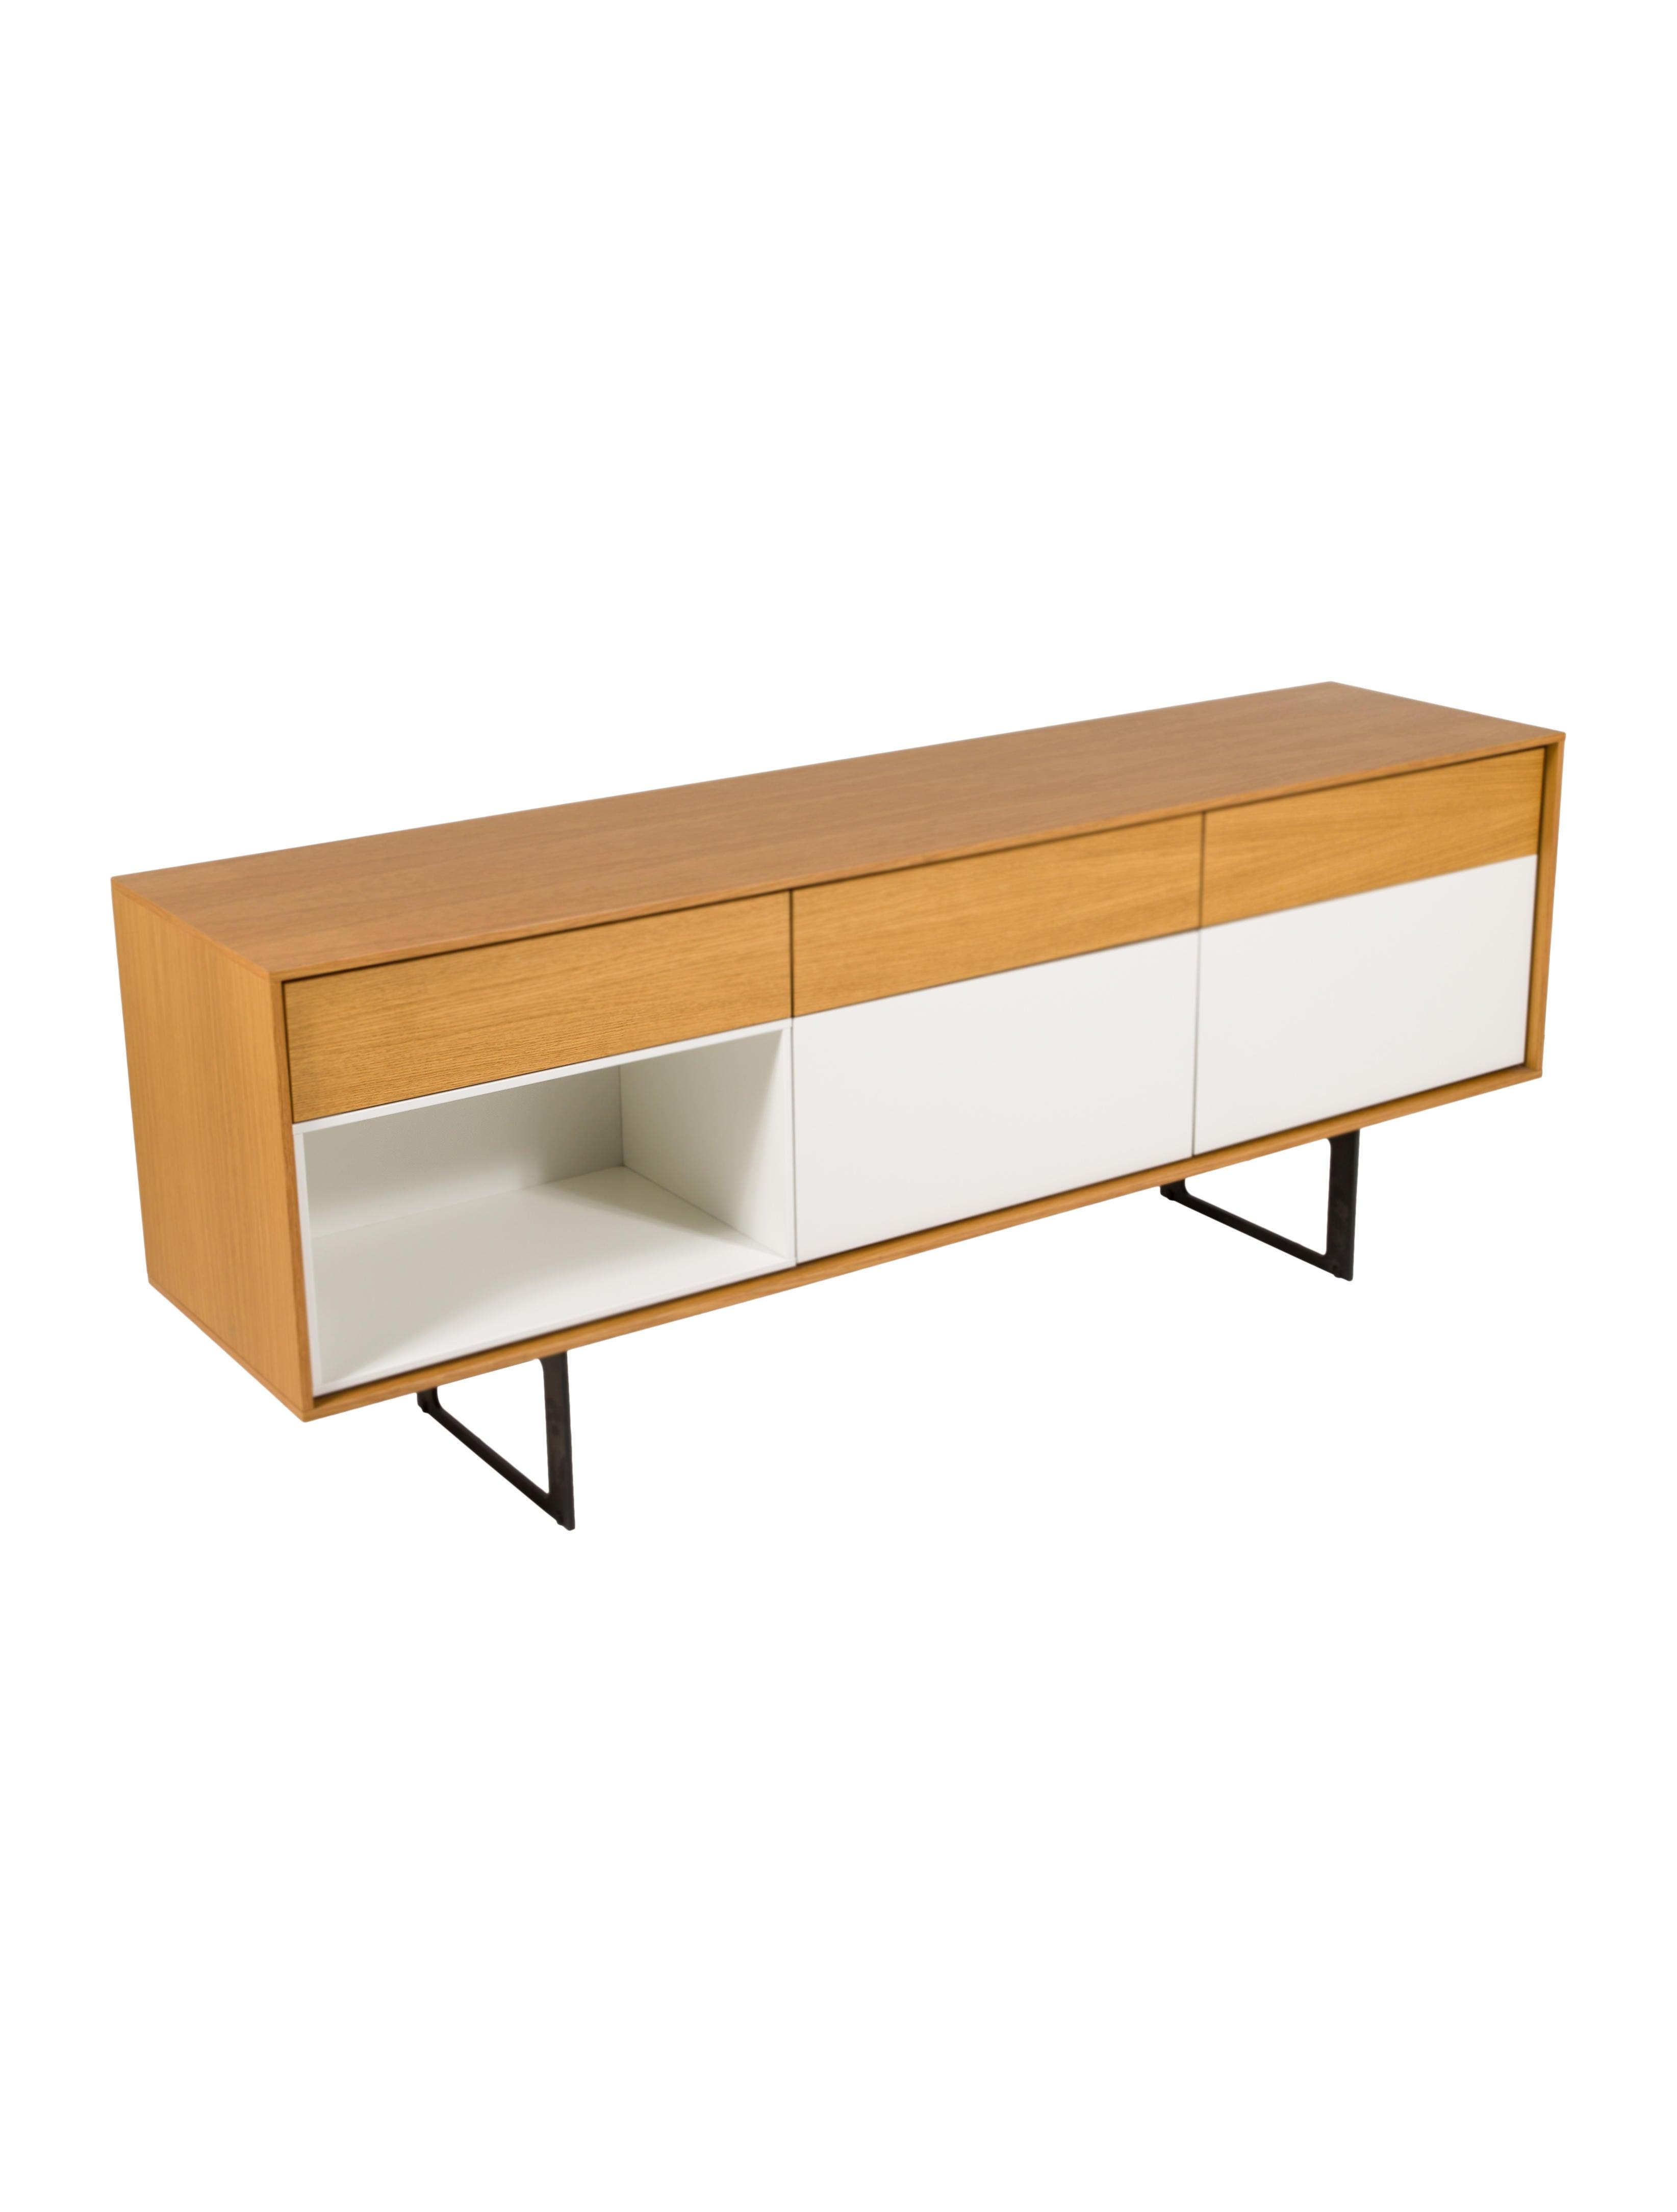 Muebles treku aura credenza furniture furni20591 the for Muebles home